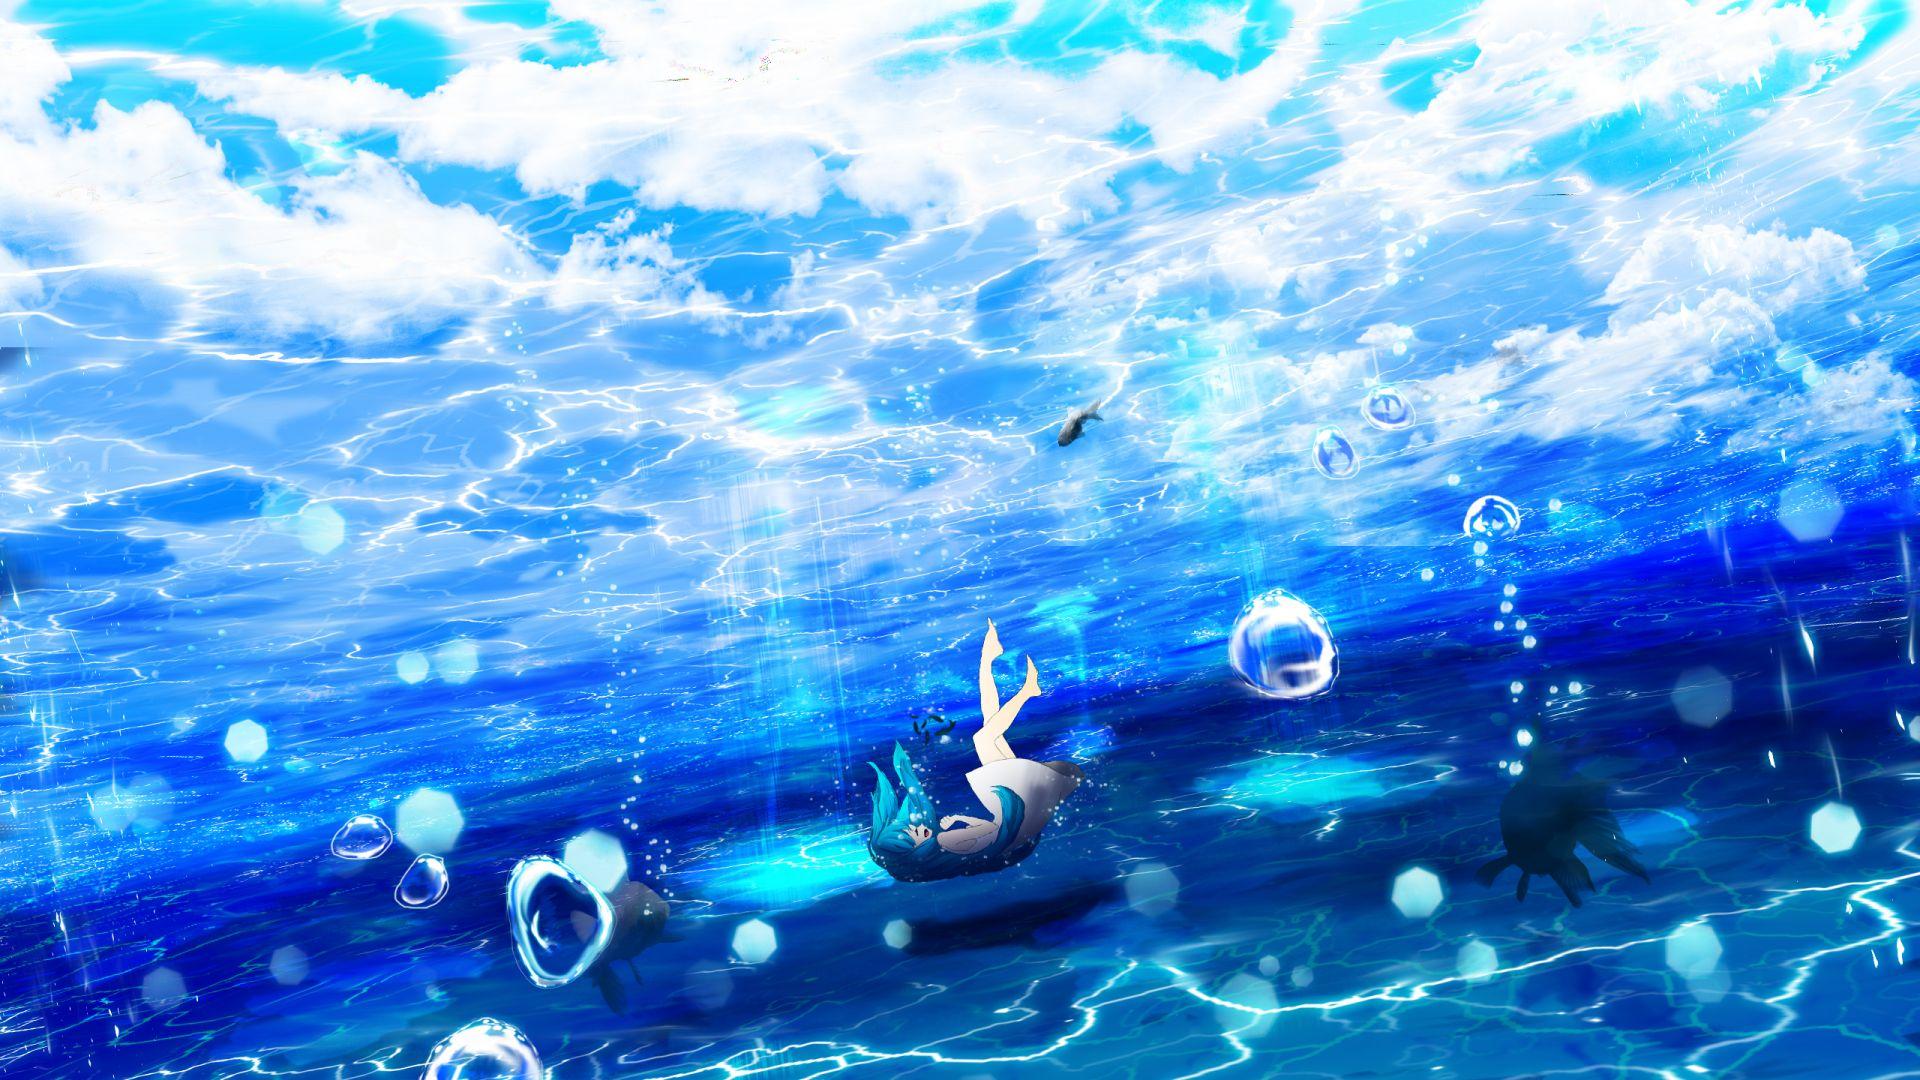 Cute Baby Girl Hd Wallpapers 1080p Desktop Wallpaper Underwater Dive Anime Girl Blue Hair